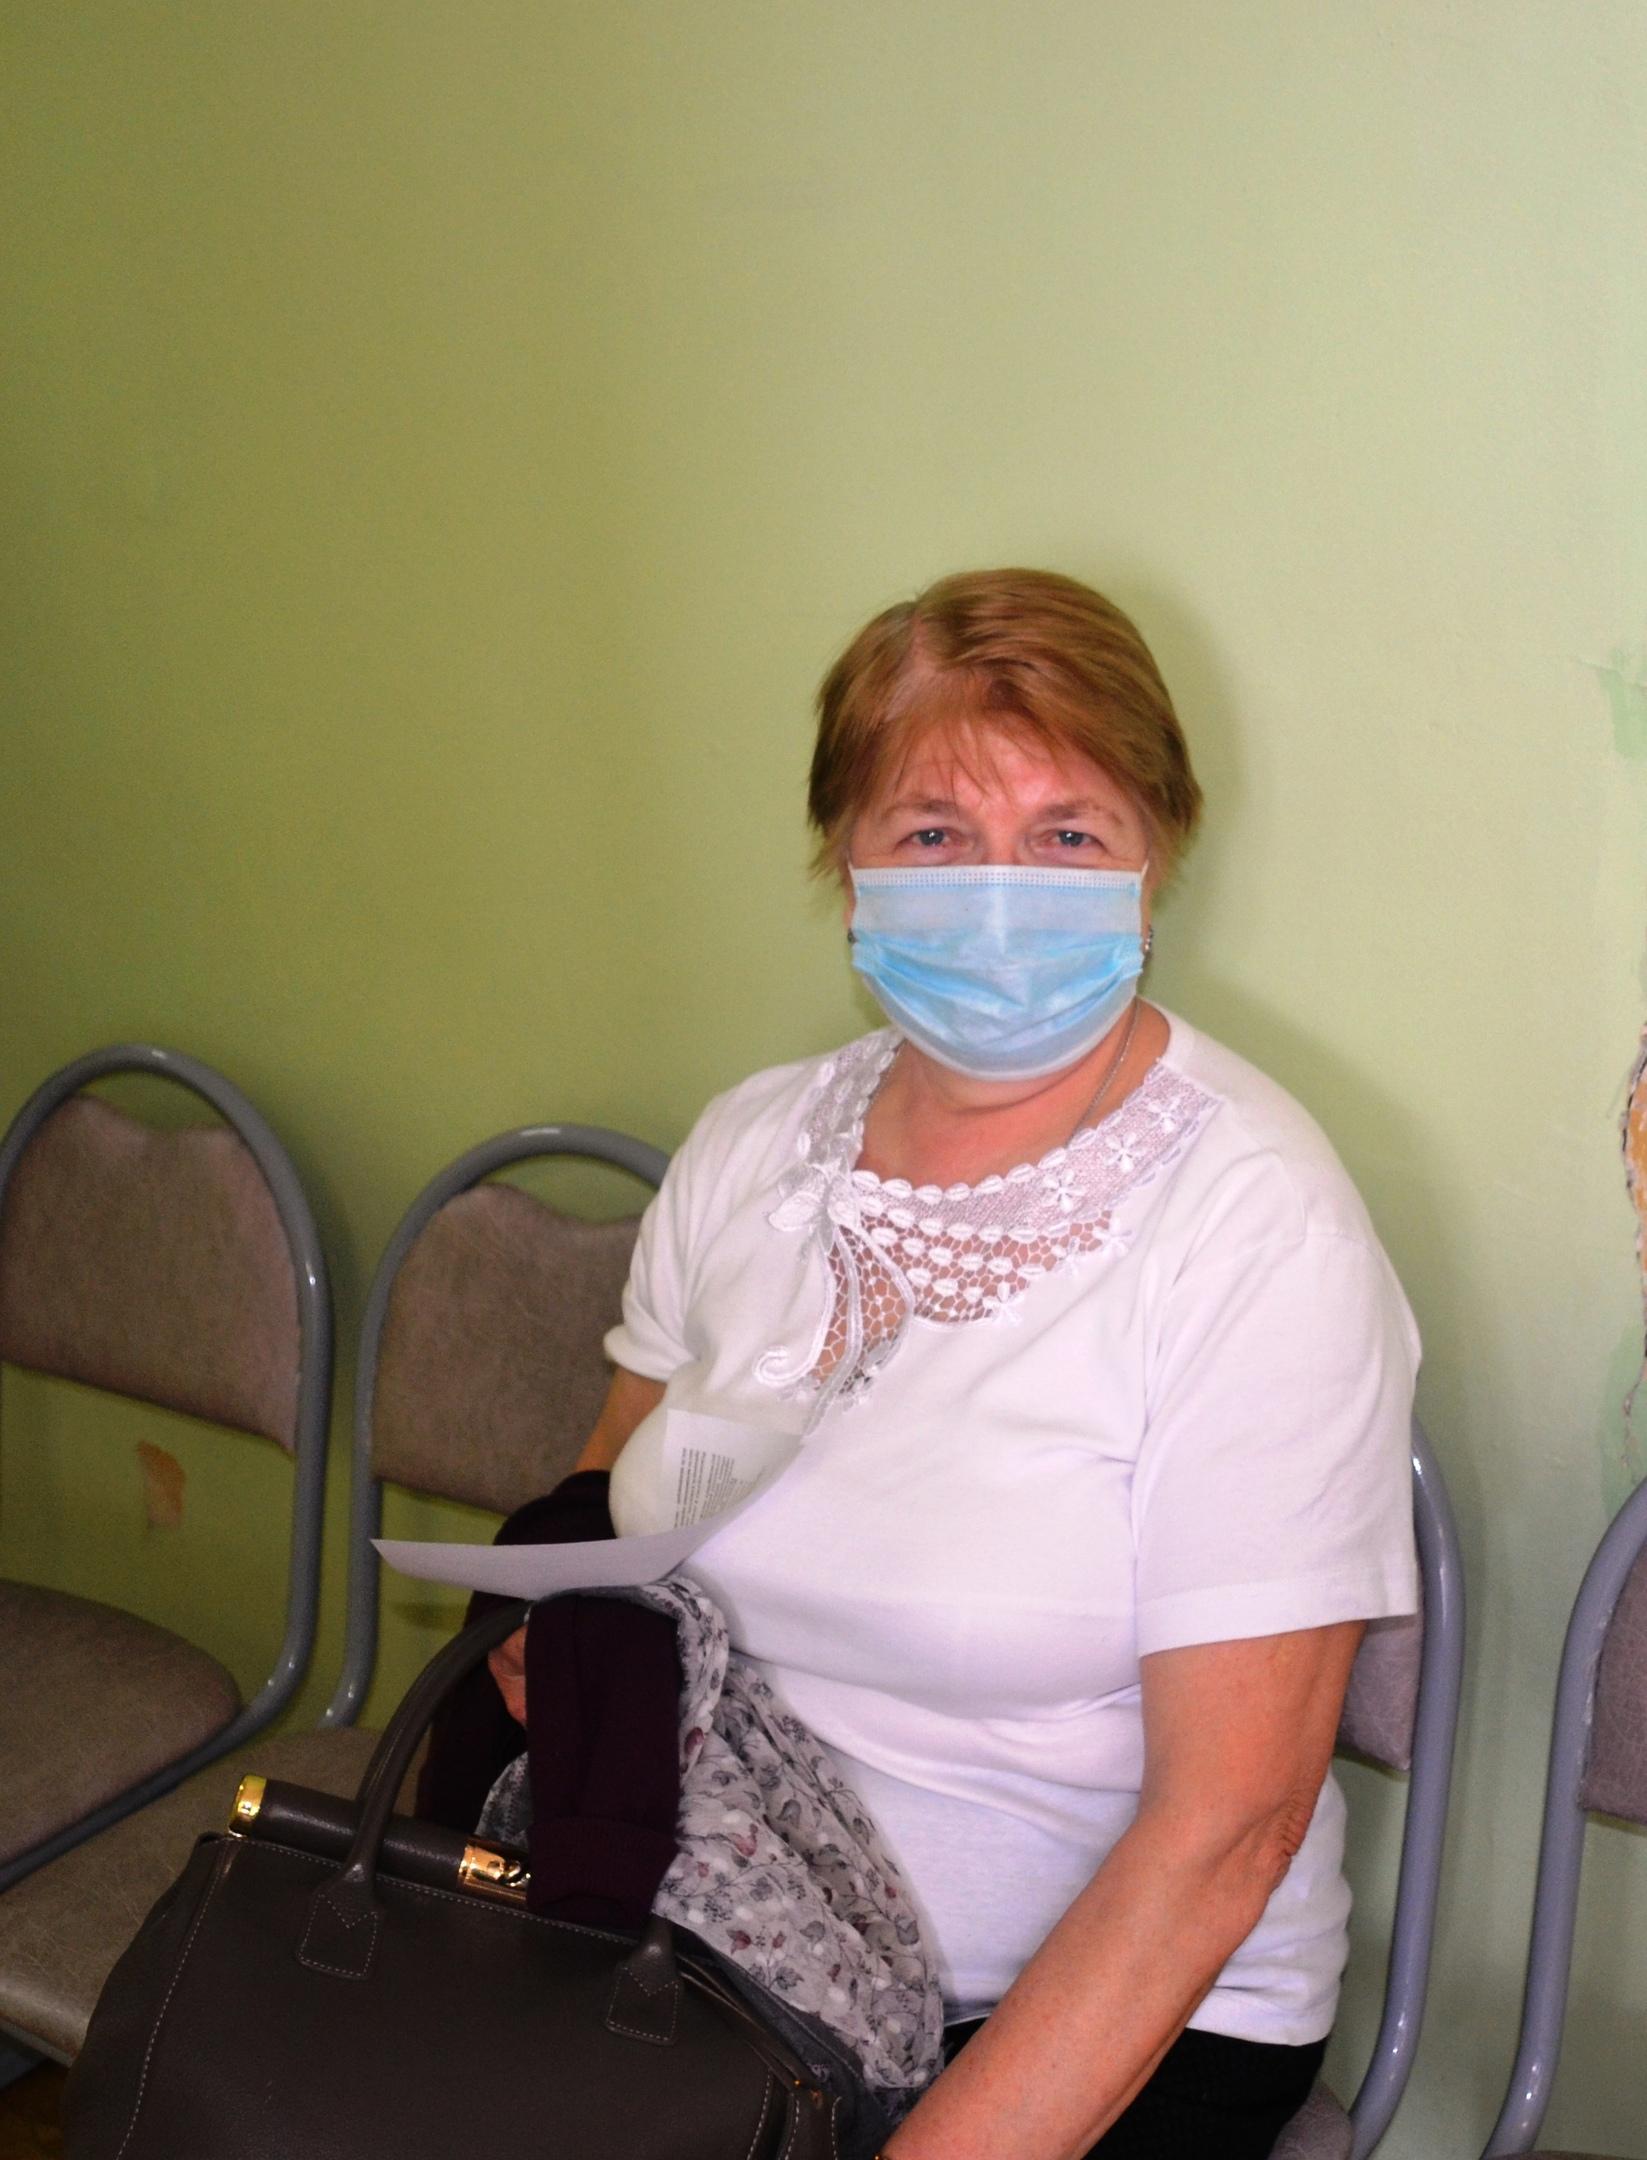 В Конаково всех желающих приглашают на вакцинацию от коронавируса